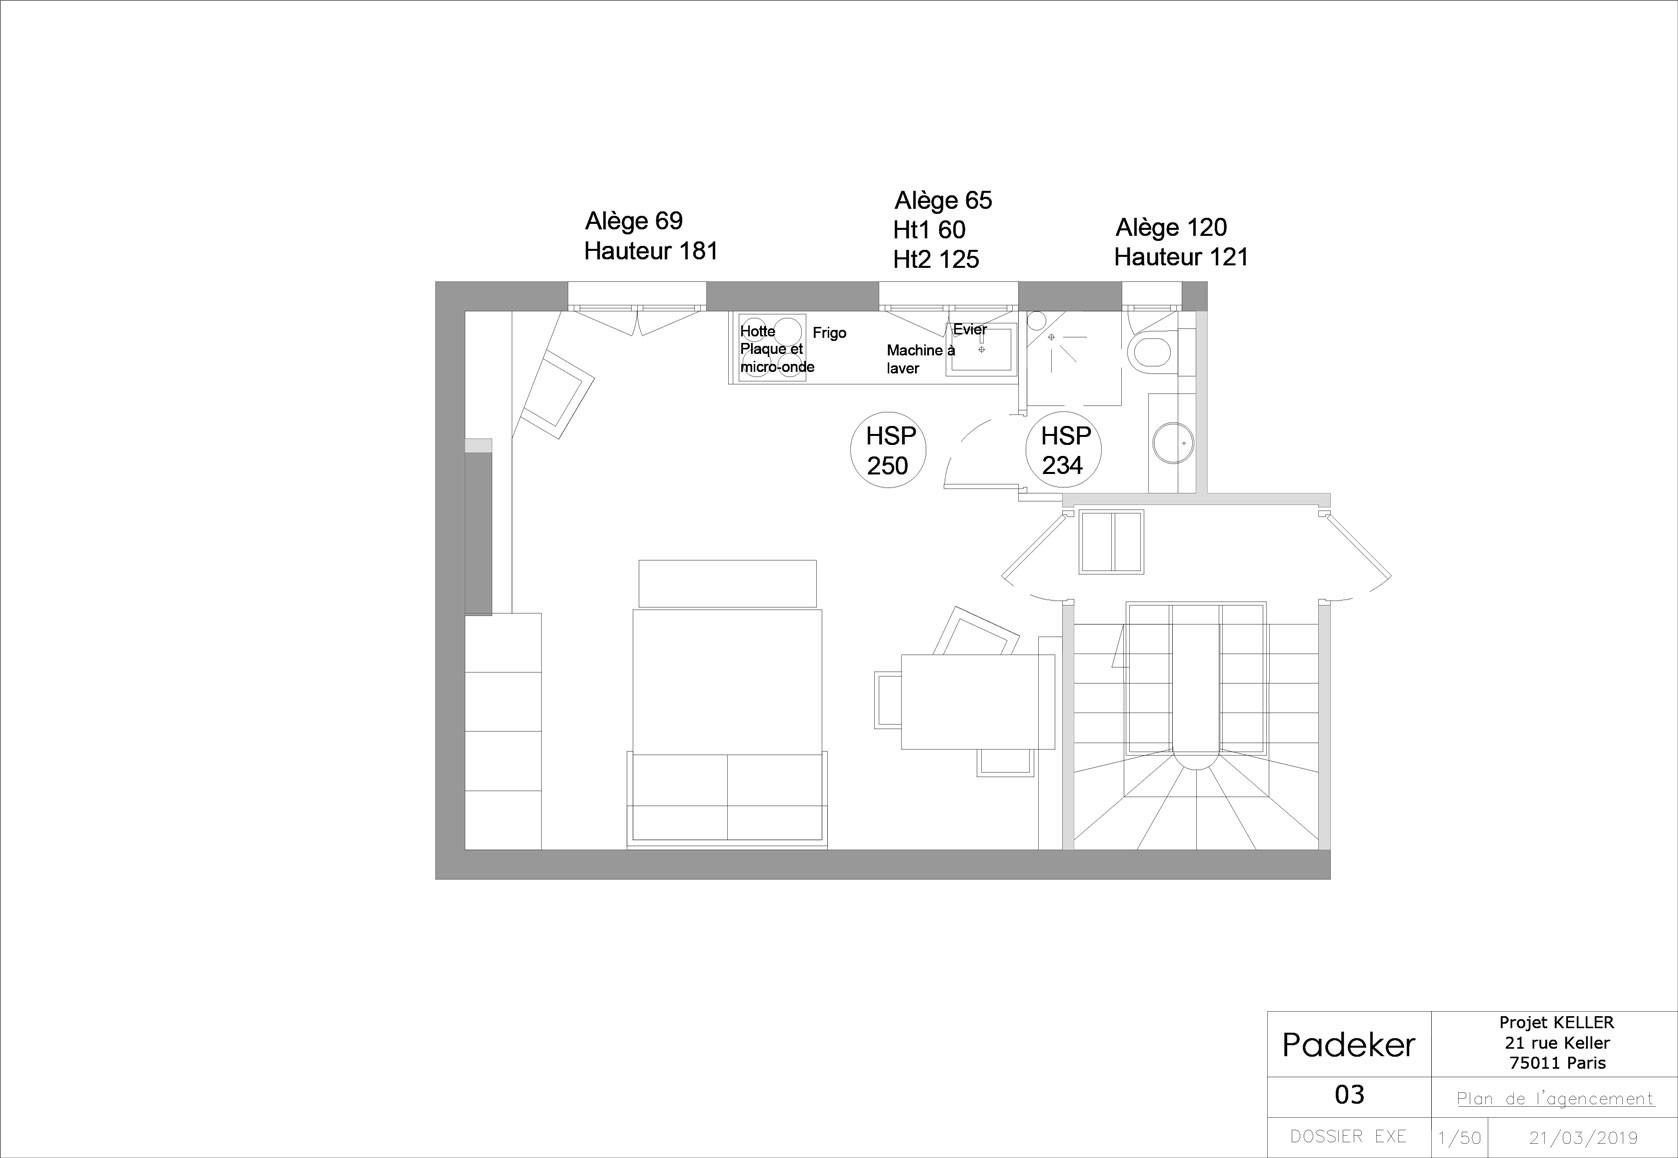 Projet-Keller-190321-03-Plan-de-l'agence